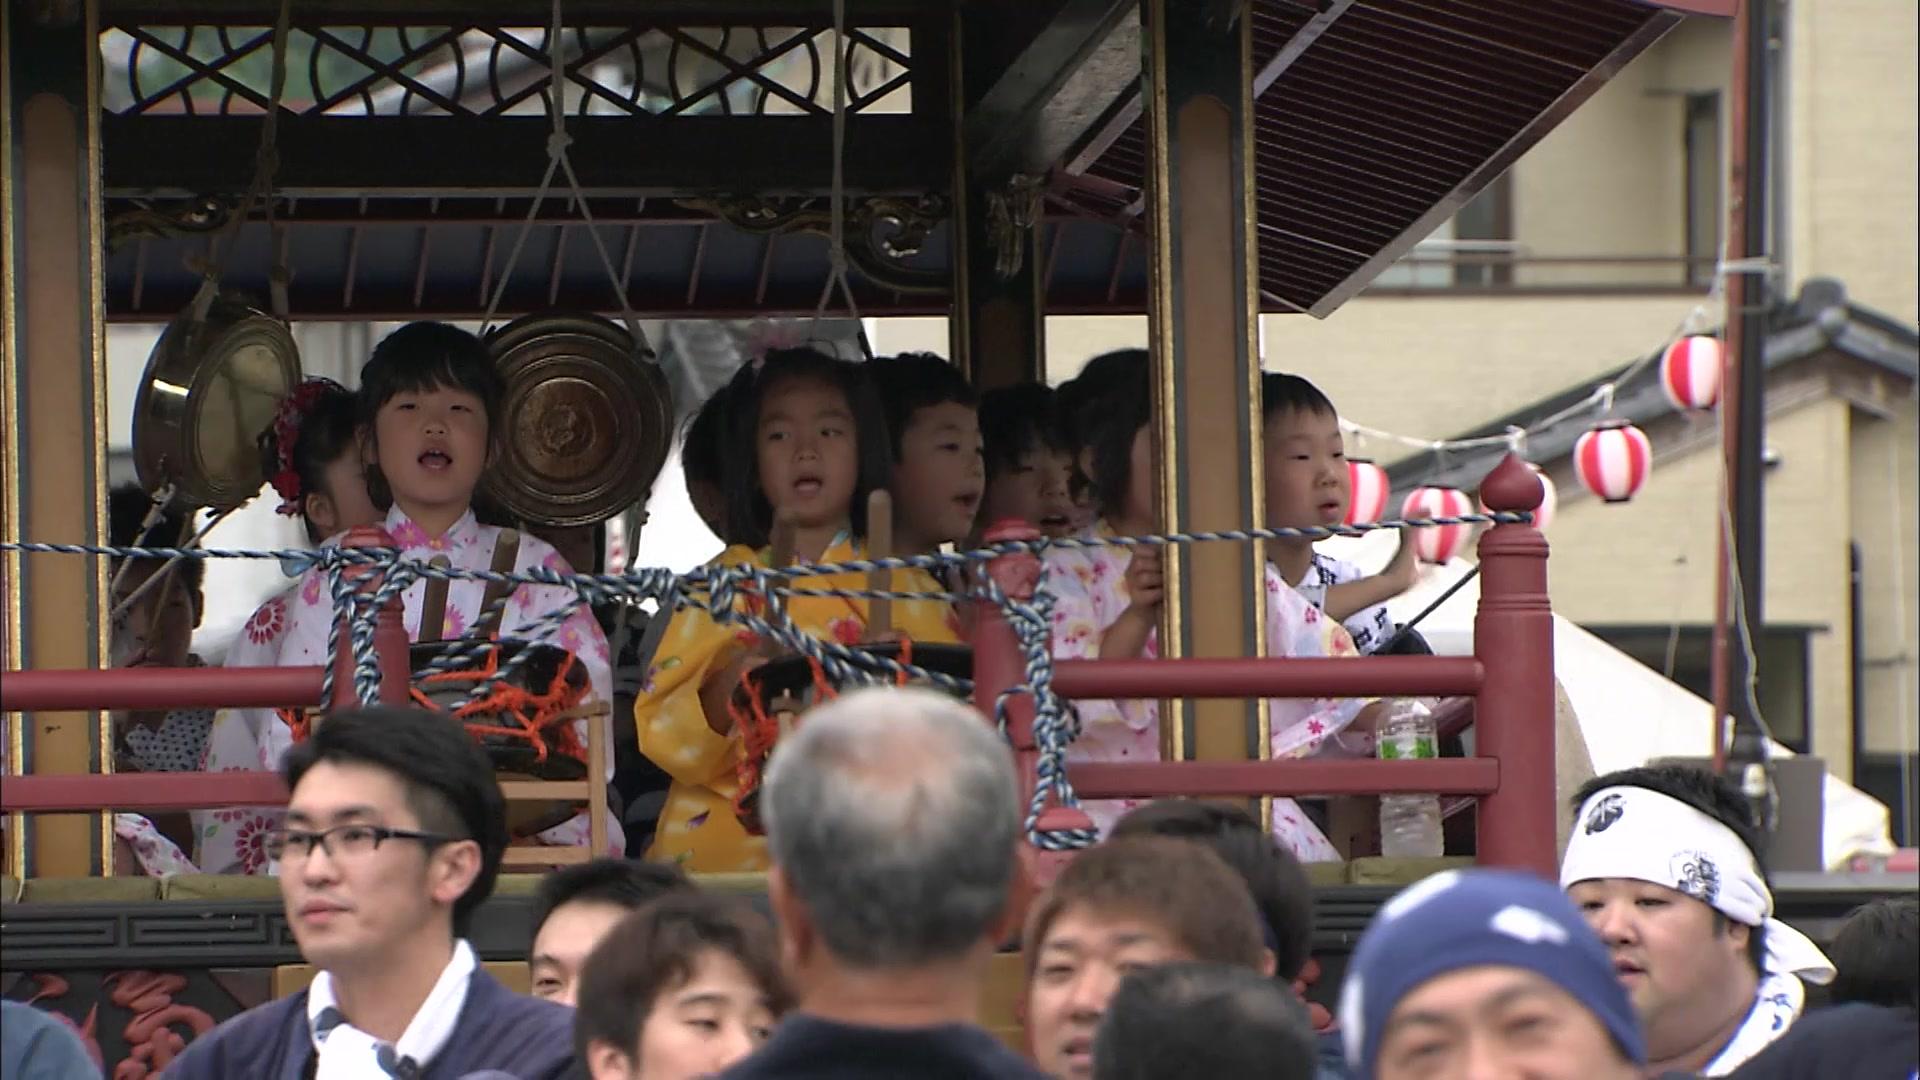 Murakami Grand Festival 2016: Tradition Passed Down Episode 1